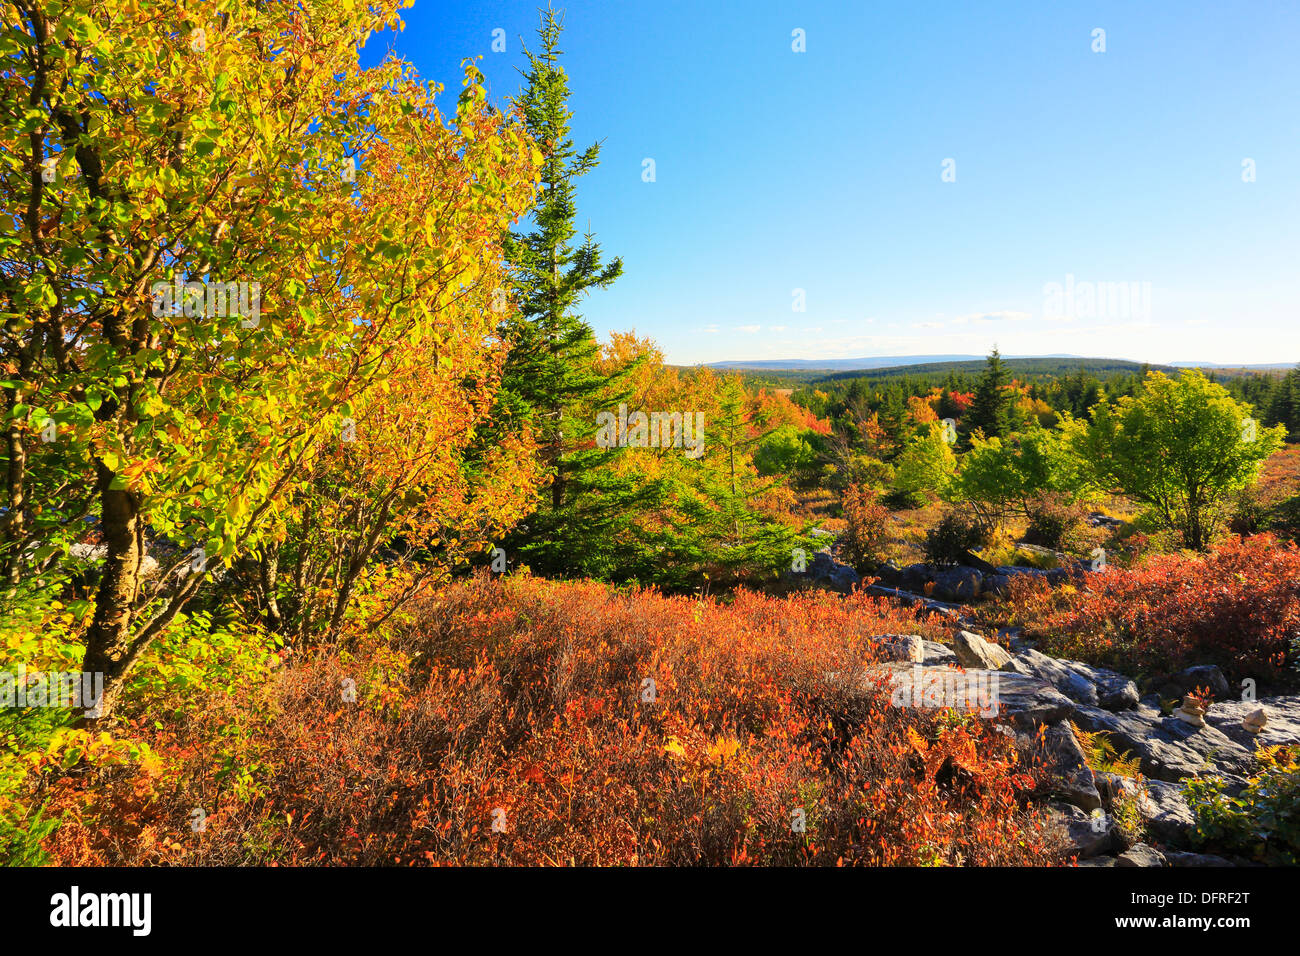 Blackbird Trail, Dolly Sods Wilderness, Hopeville, West Virginia, USA - Stock Image